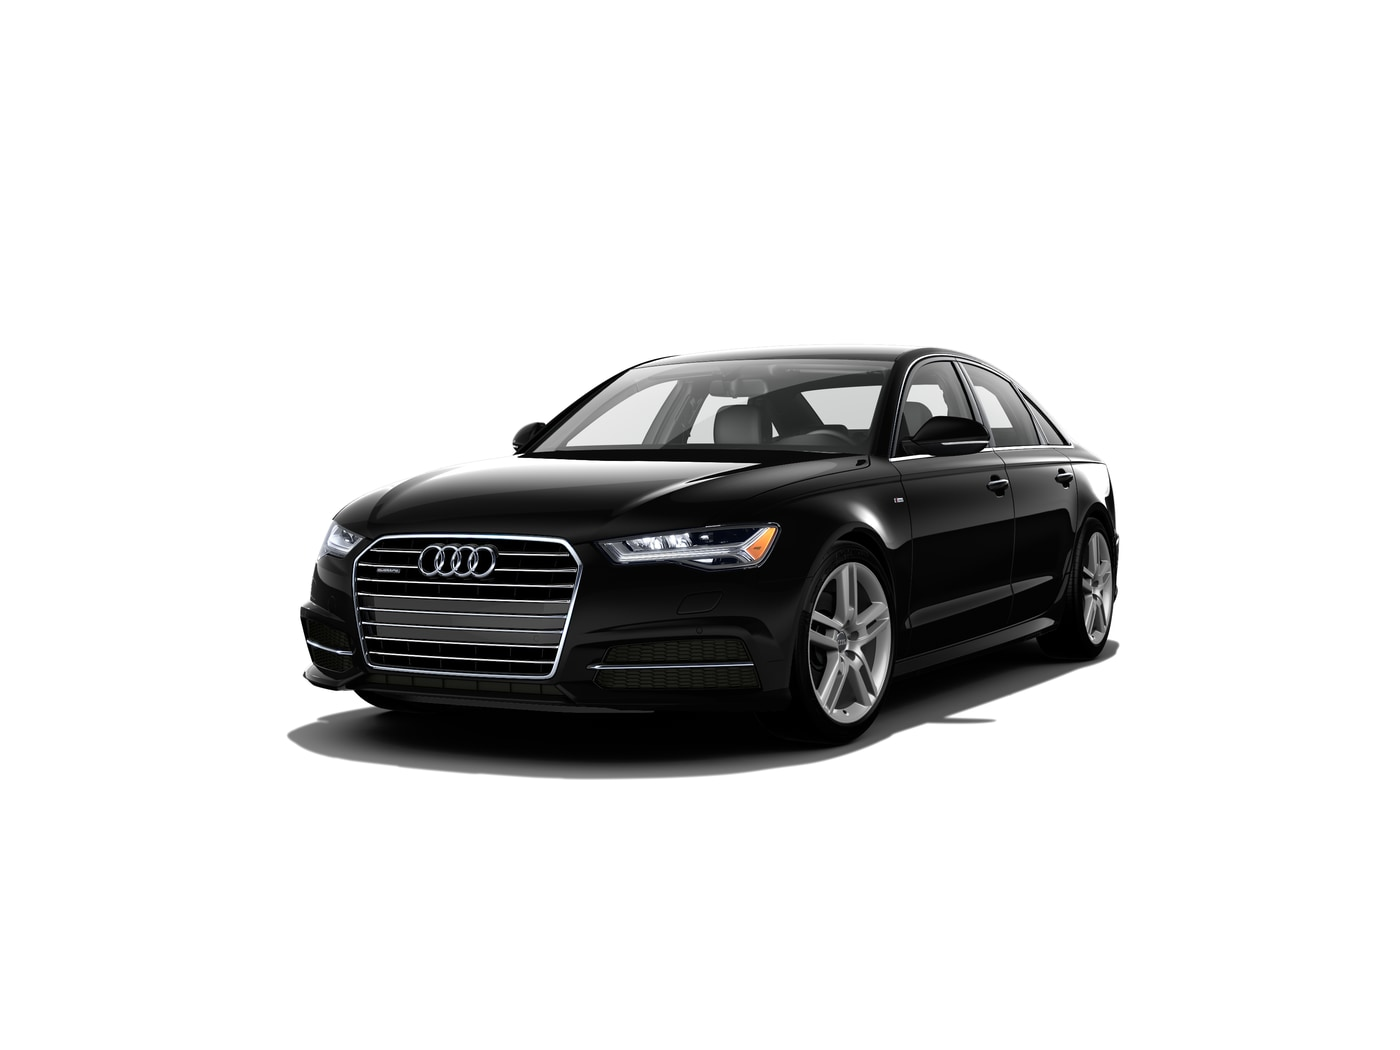 2016 Audi A6 4dsd